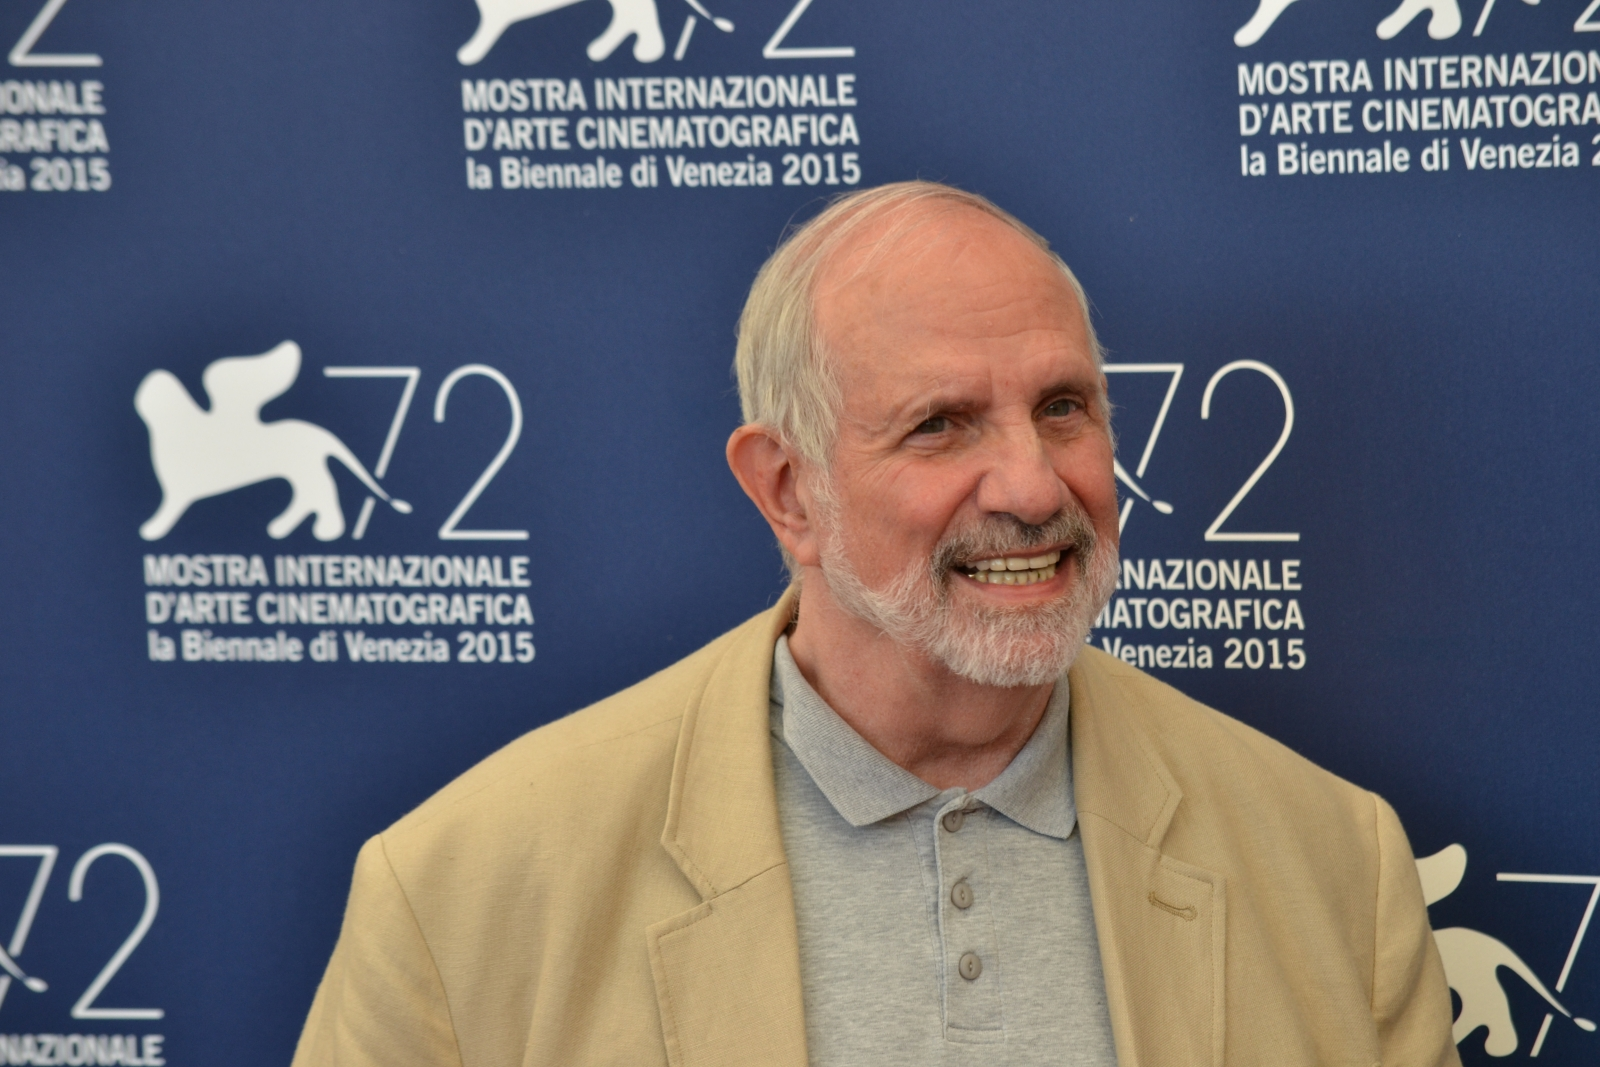 Venezia 2015: Brian De Palma sorride al photocall per lo Jaeger-LeCoultre Glory to the Filmmaker 2015 Award